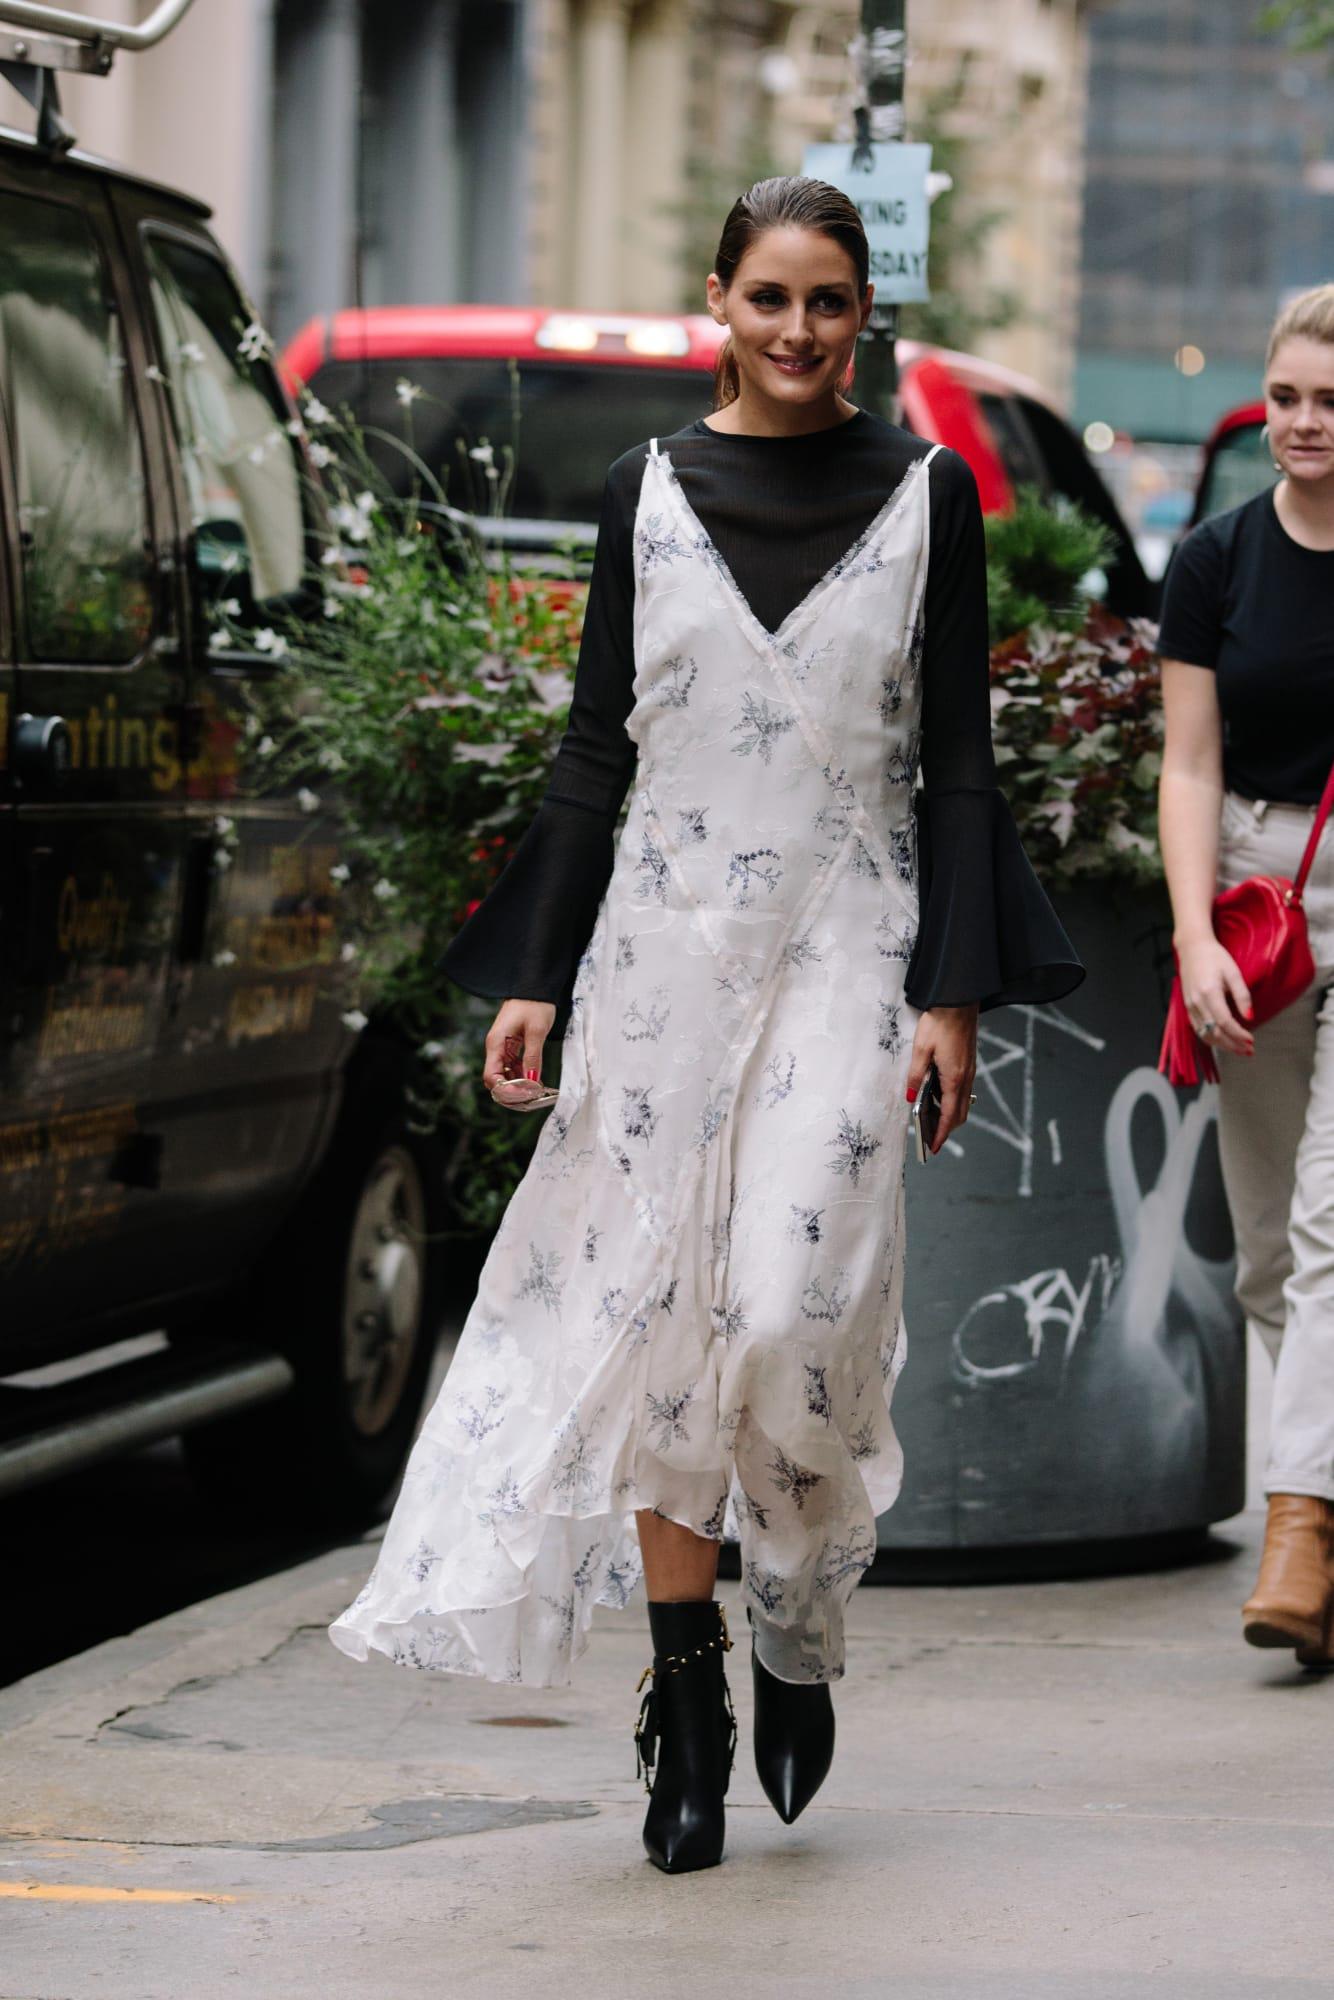 new-york-fashion-week-street-style-spring-2019-day-2-16.jpg